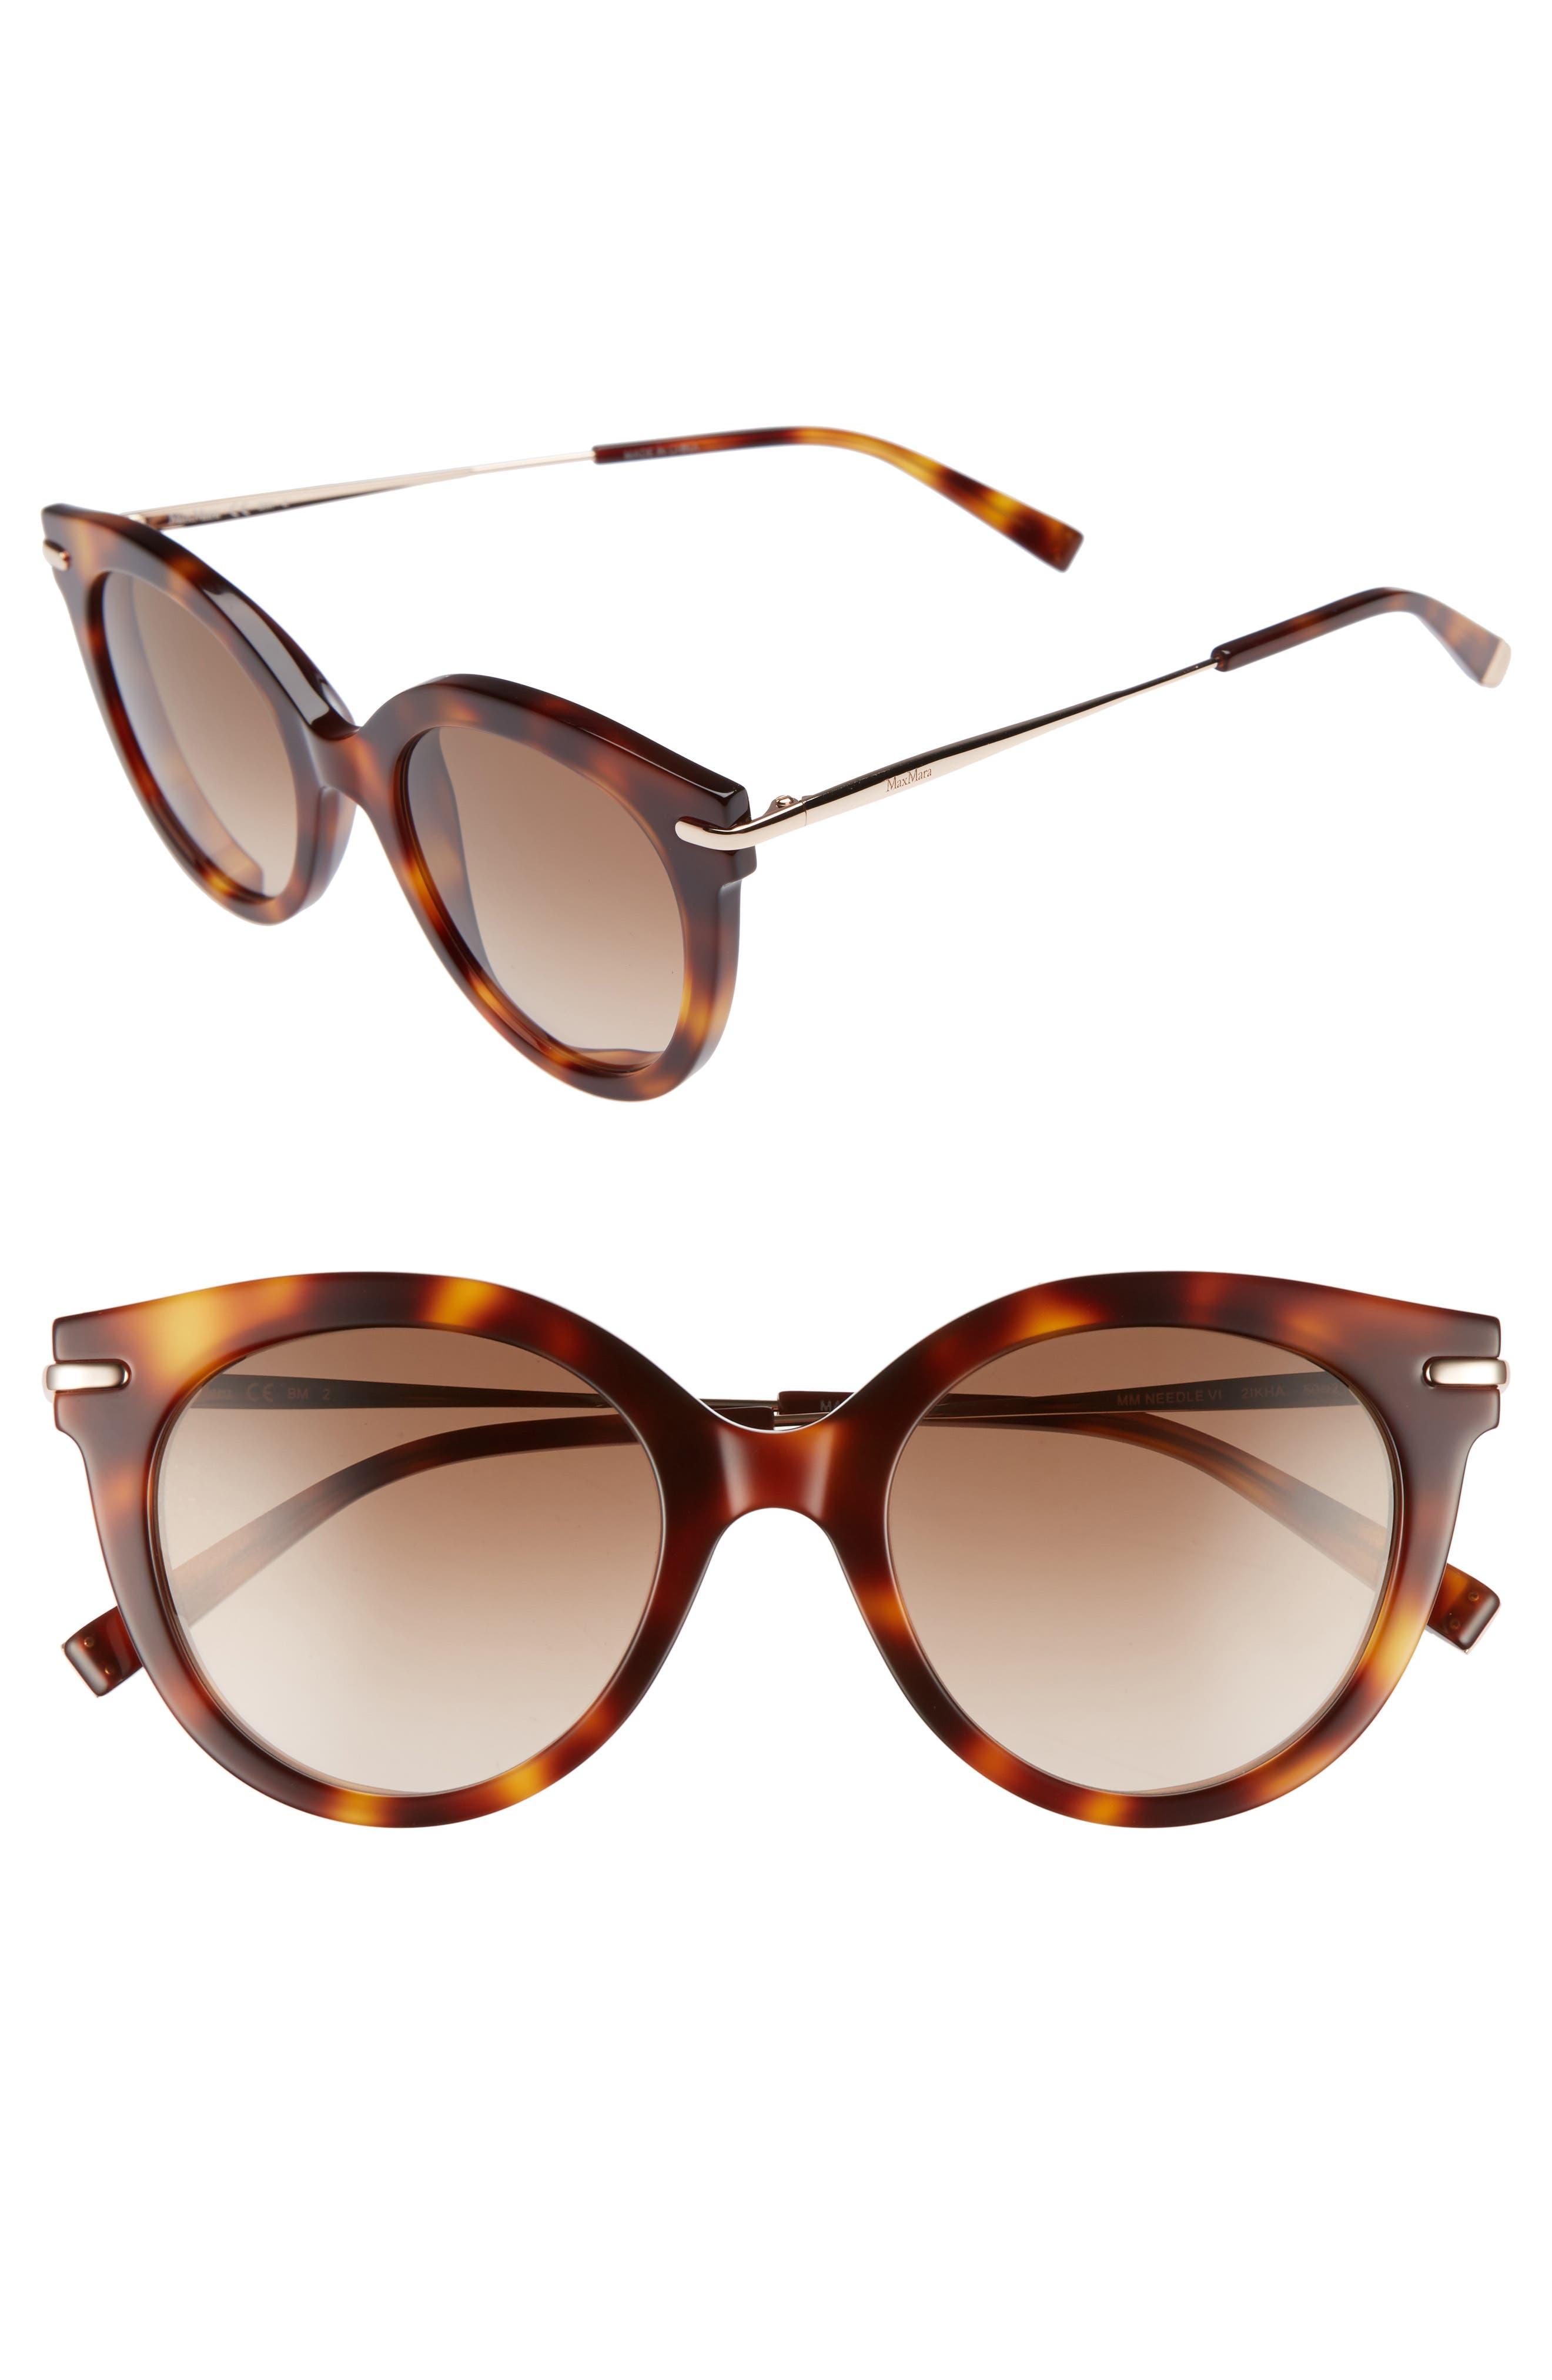 Needle VI 50mm Gradient Round Sunglasses,                             Main thumbnail 1, color,                             Havana Gold